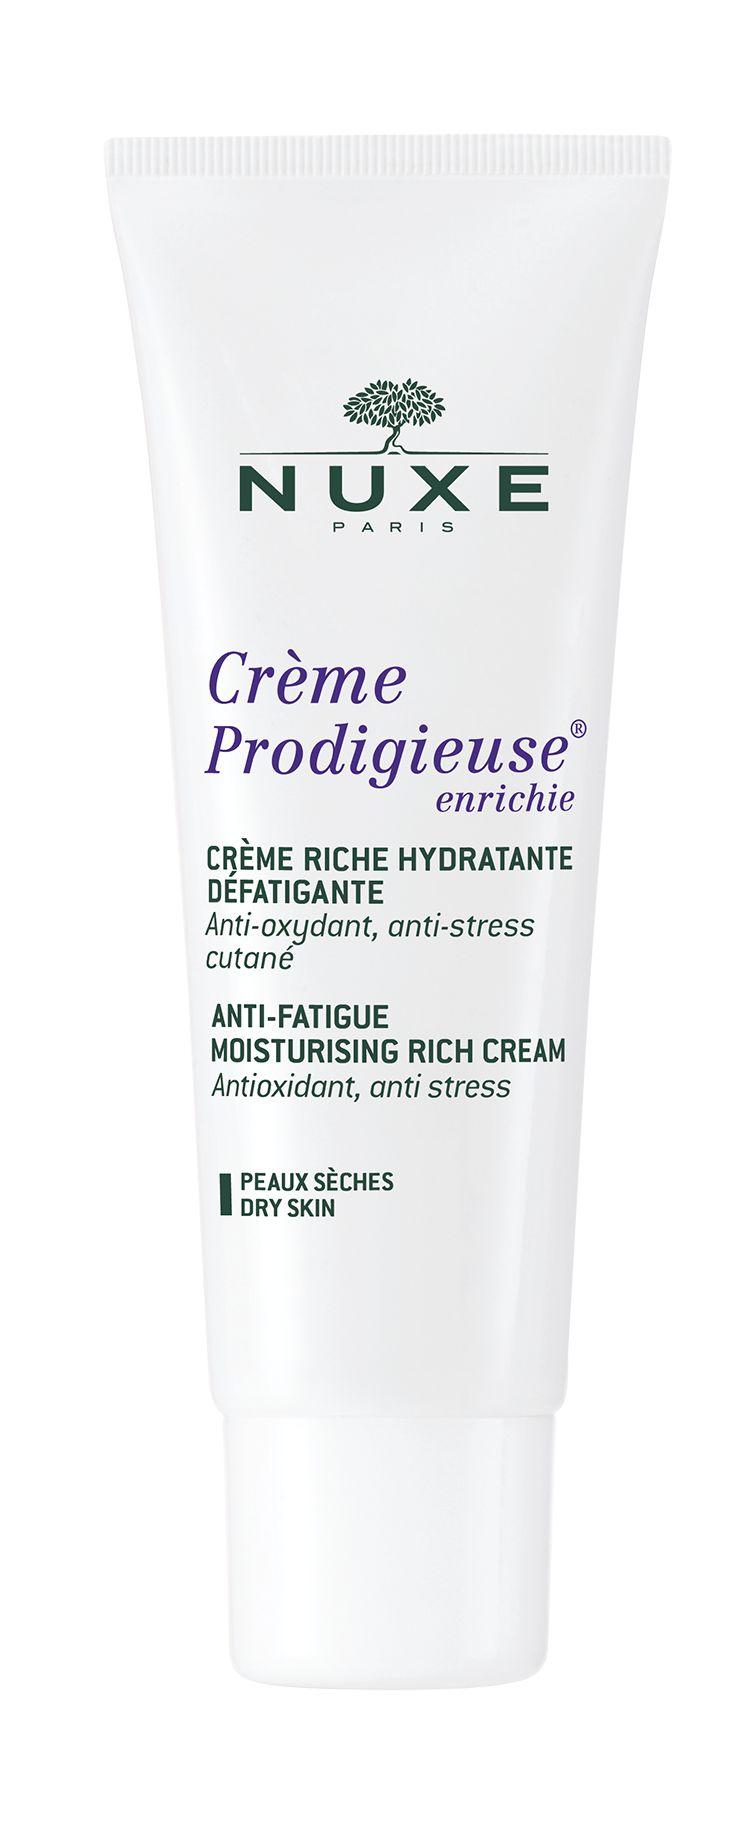 Nuxe Prodigieuse Crème Enrichie - Ενυδατική Κρέμα για Ξηρό/Πολύ Ξηρό Δέρμα 40ml. Μάθετε περισσότερα ΕΔΩ: https://www.pharm24.gr/index.php?main_page=product_info&products_id=8184